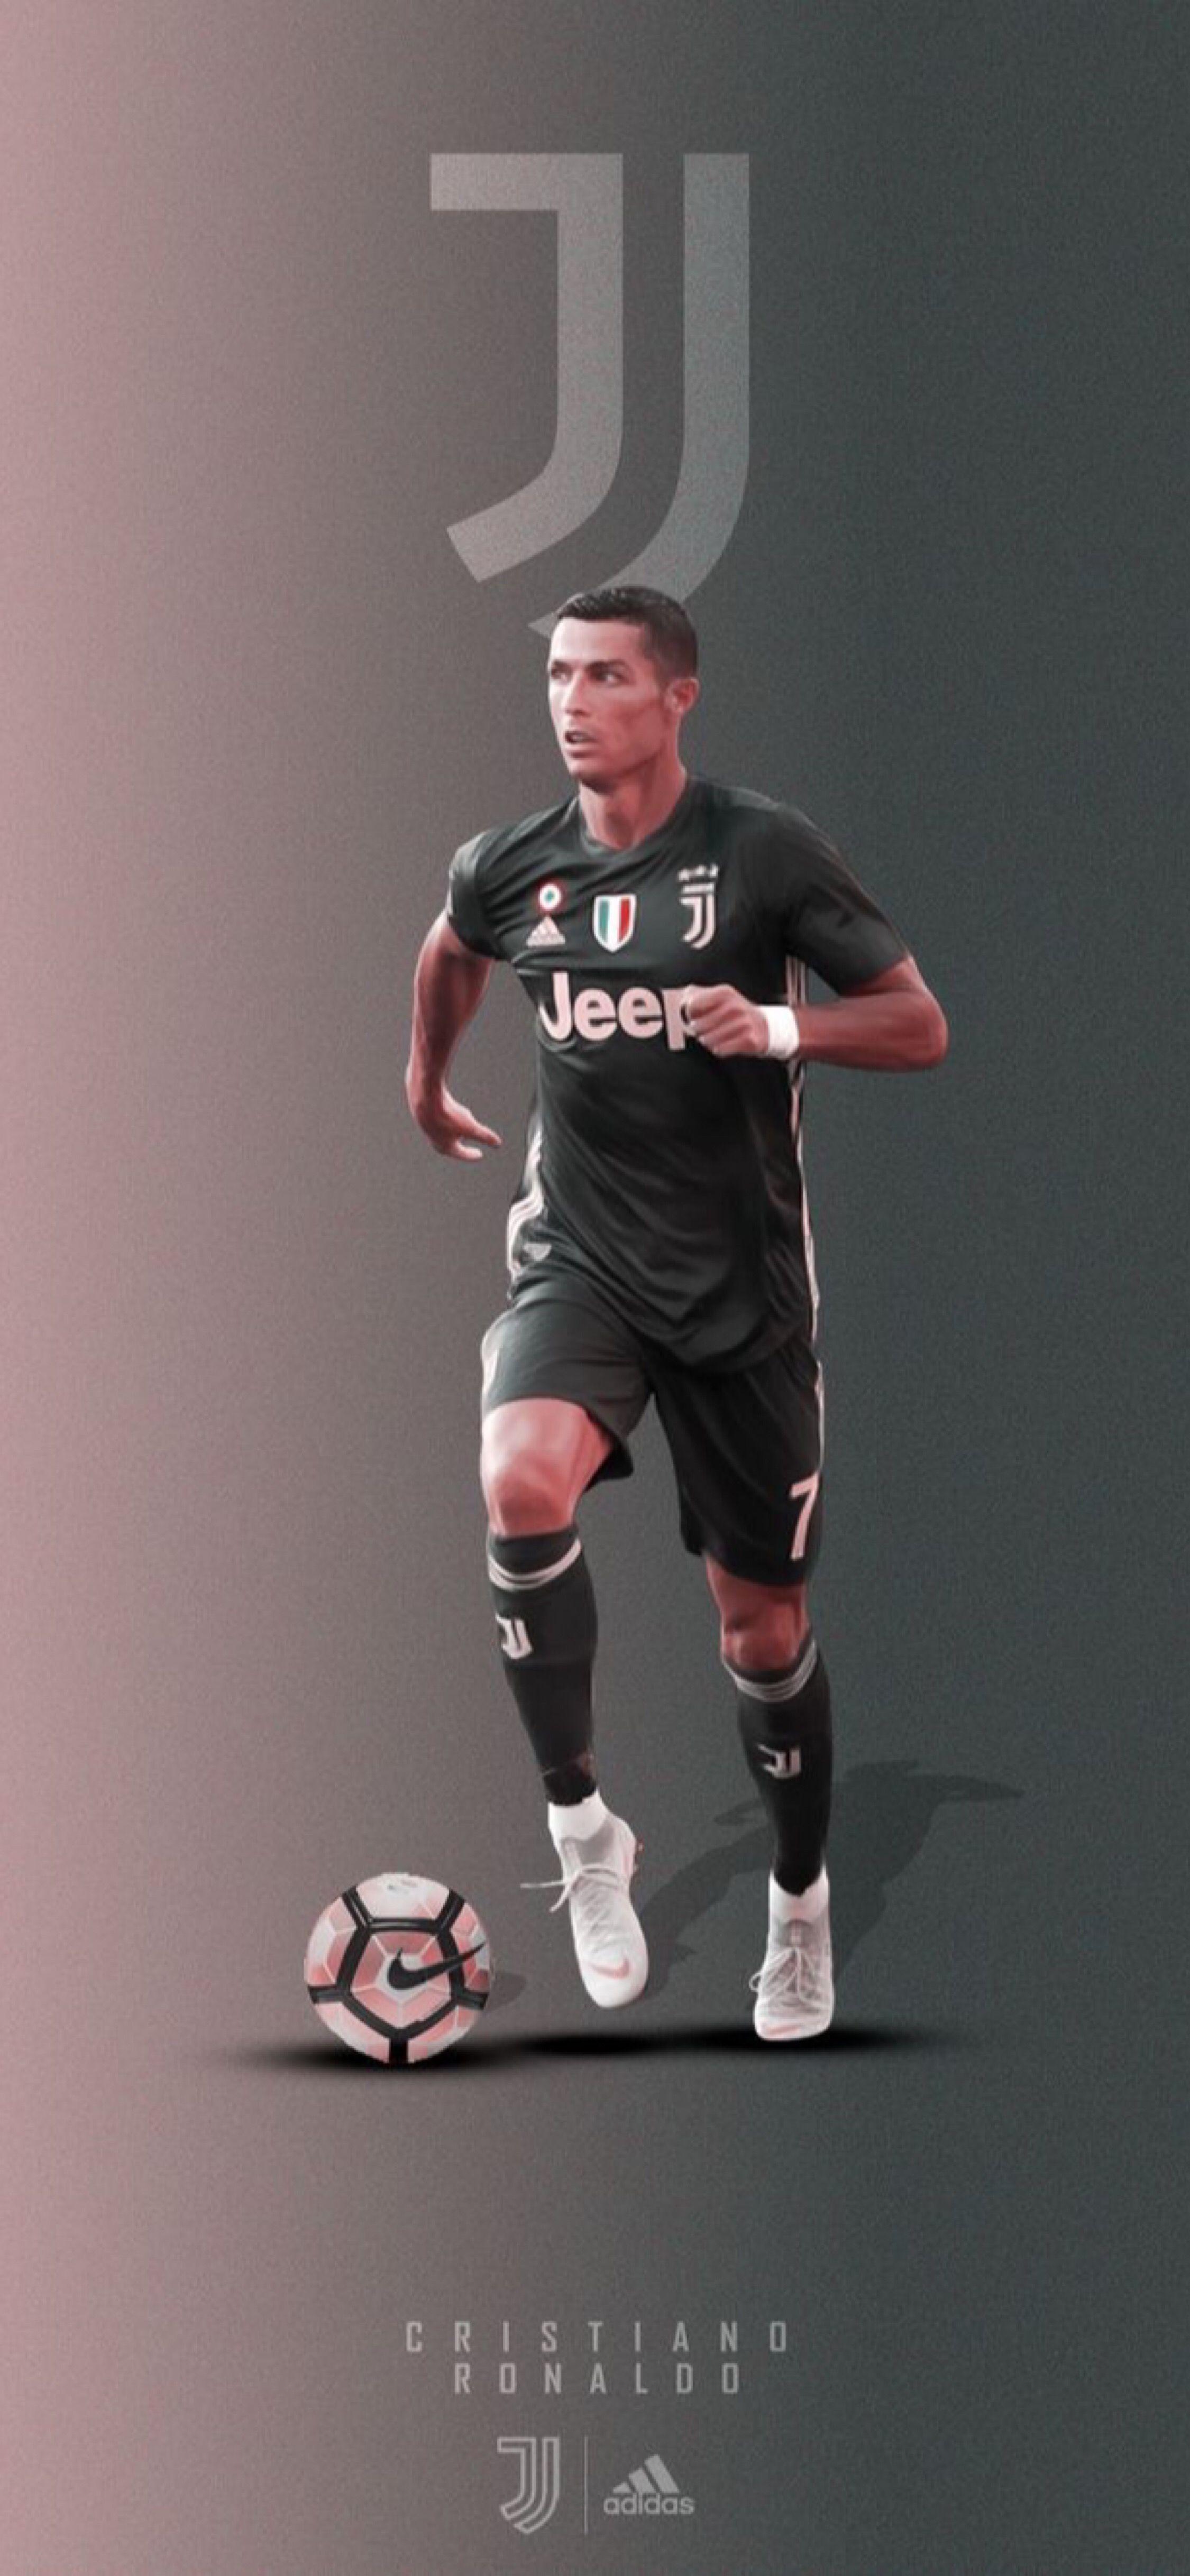 Pin By Tarick Prendergast On Iphone X Cristiano Ronaldo